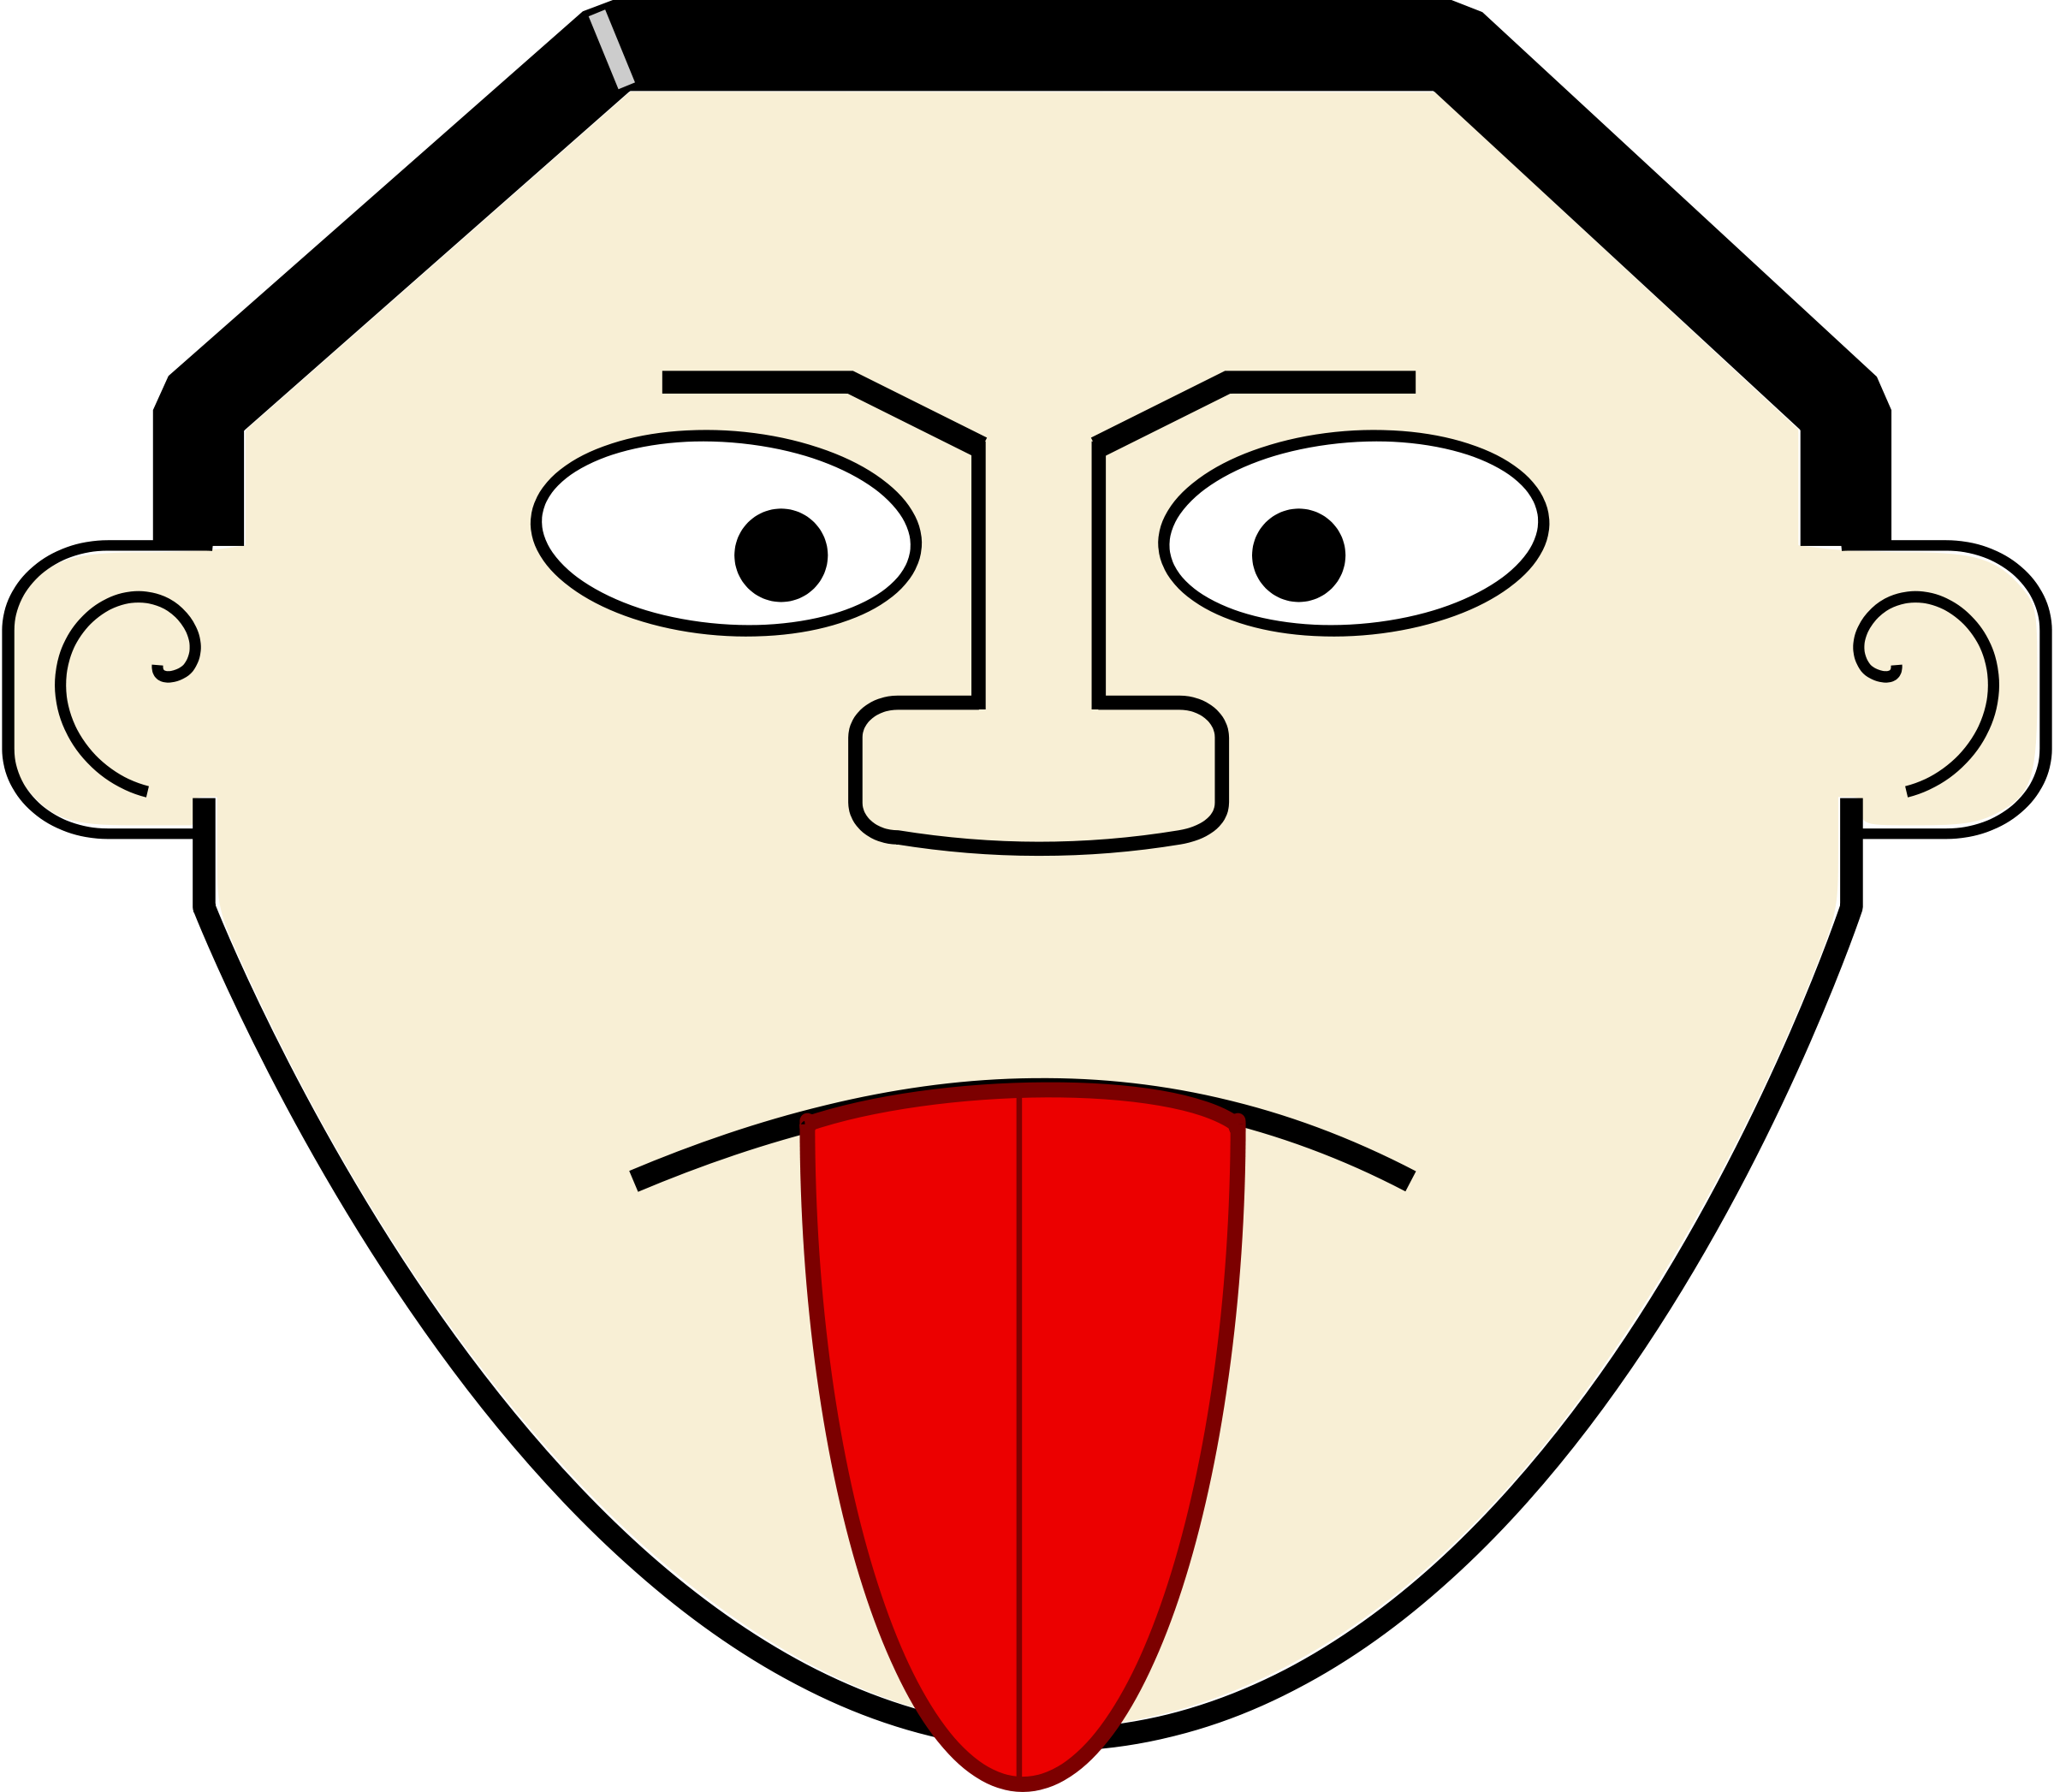 Taste clipart mouth open. Tongue clip art panda